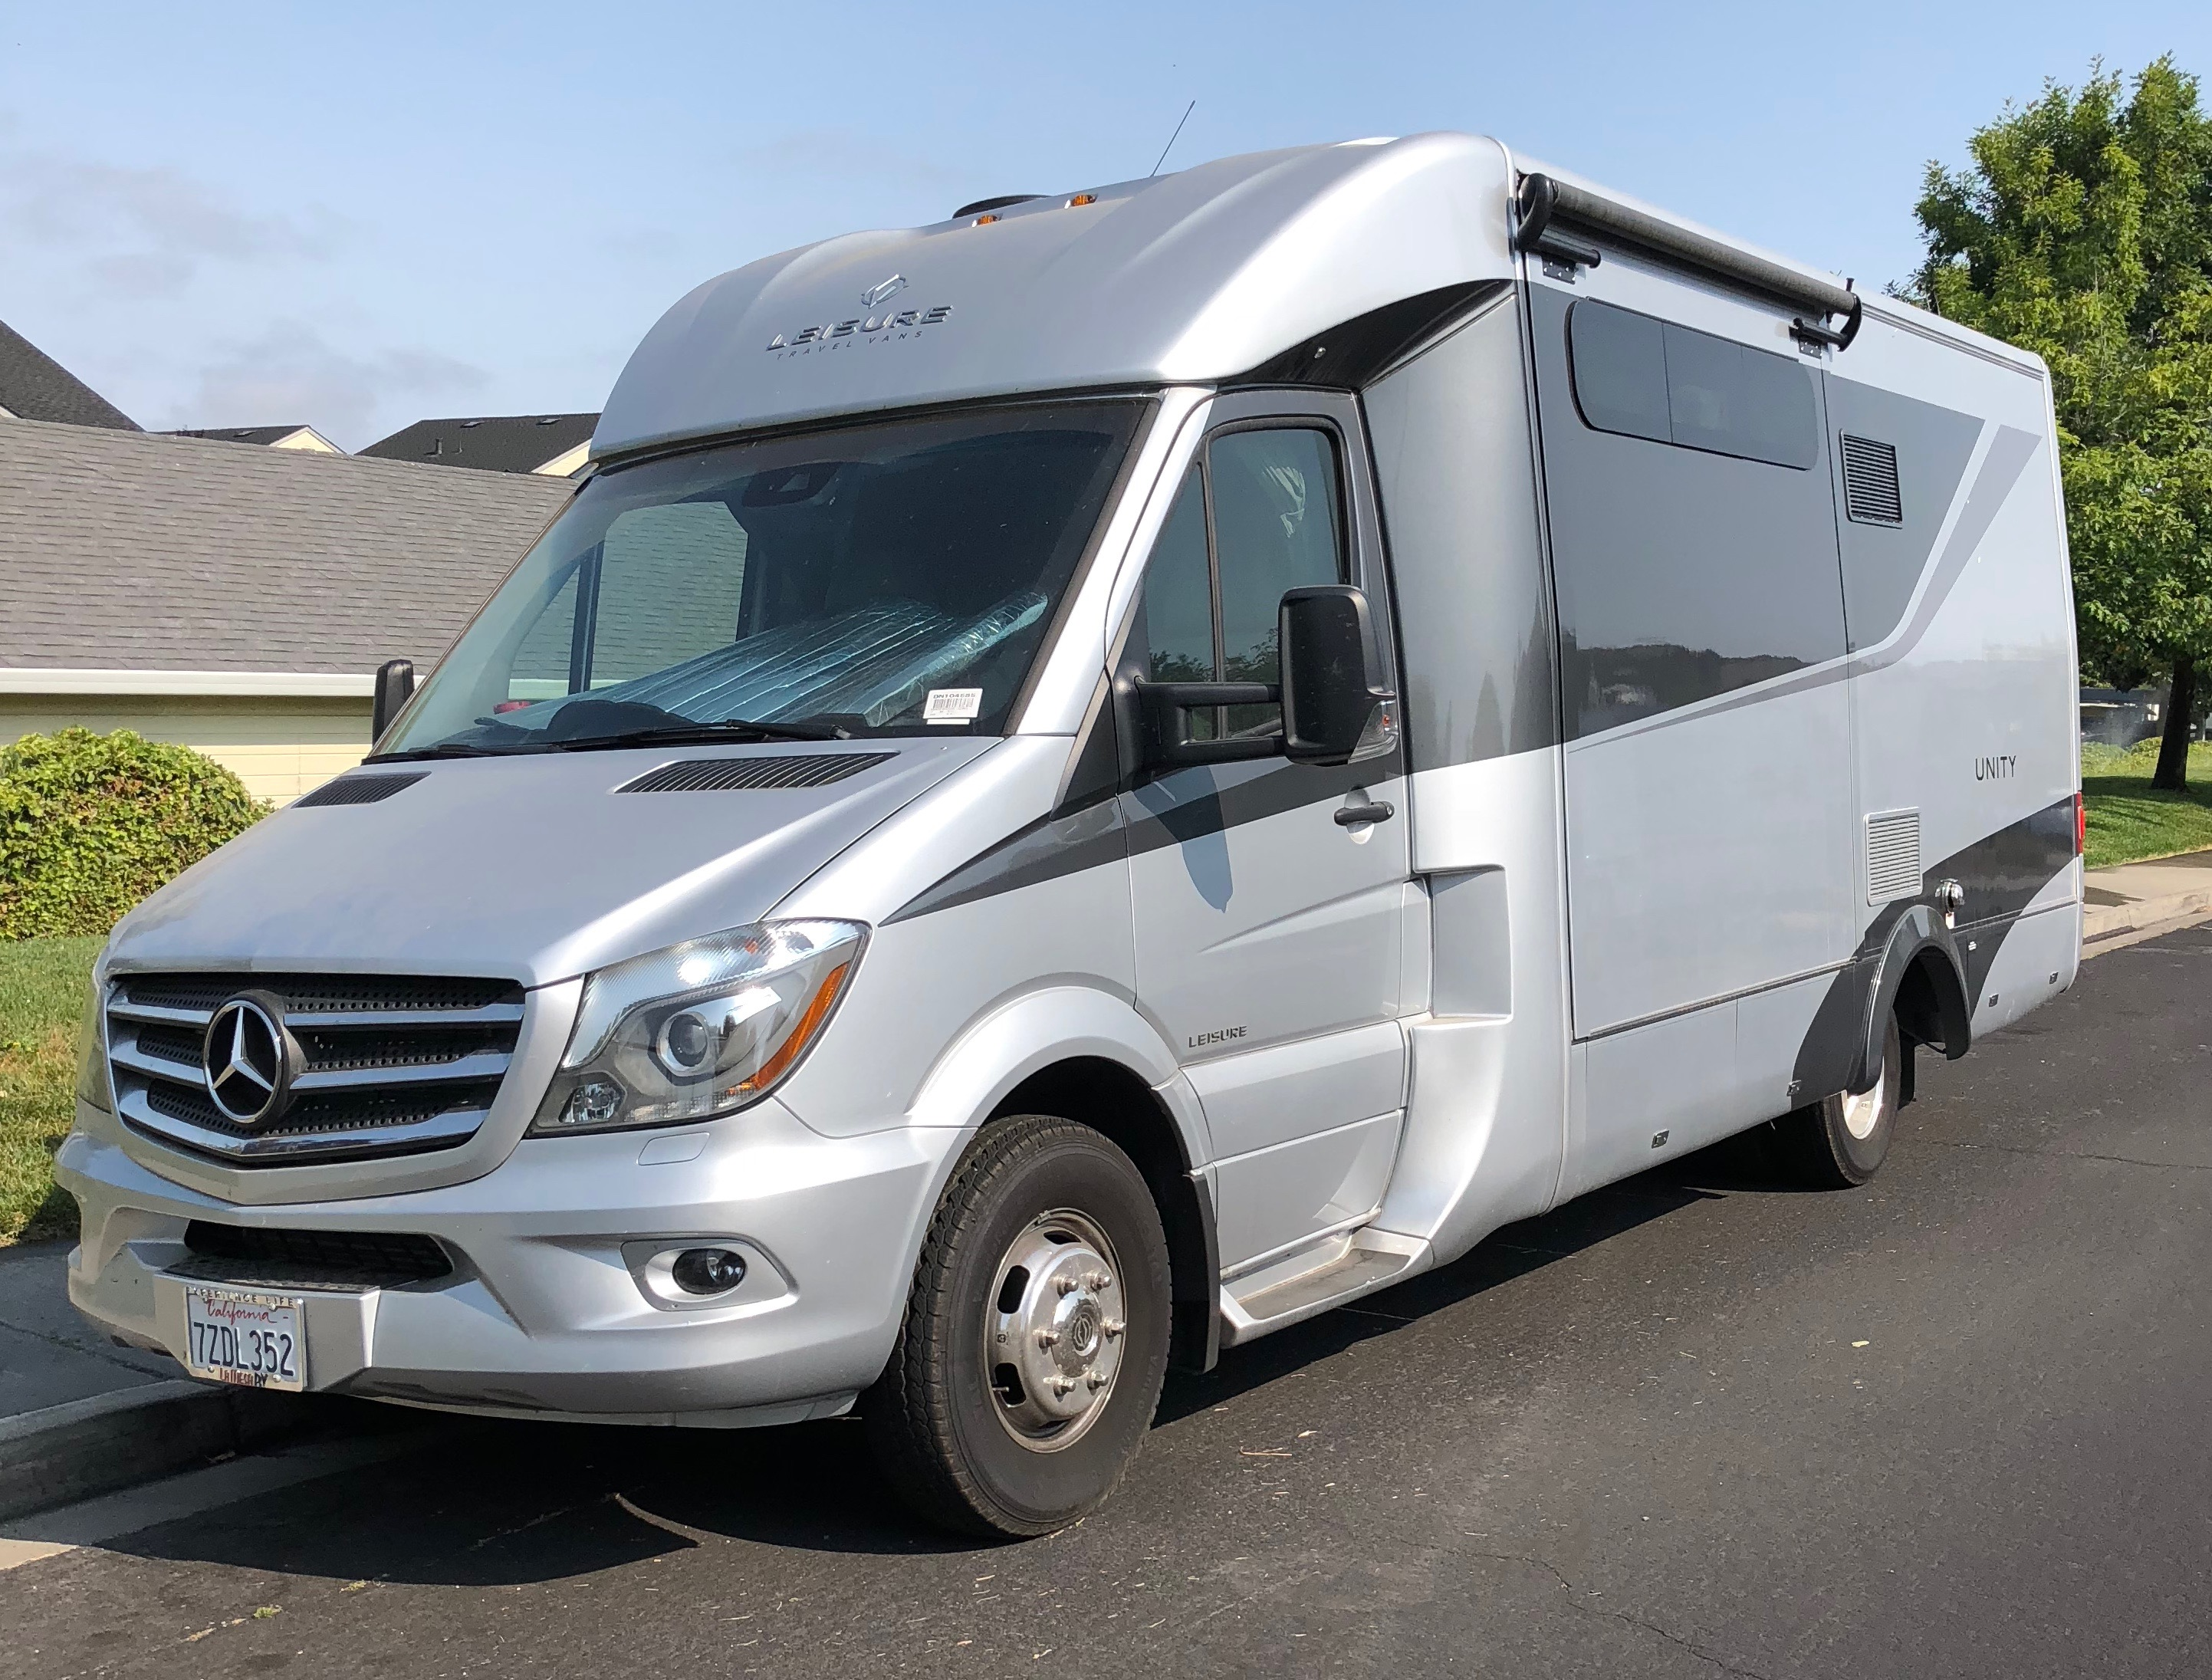 Leisure Travel Vans For Rent >> 2017 Leisure Travel Van The Unity